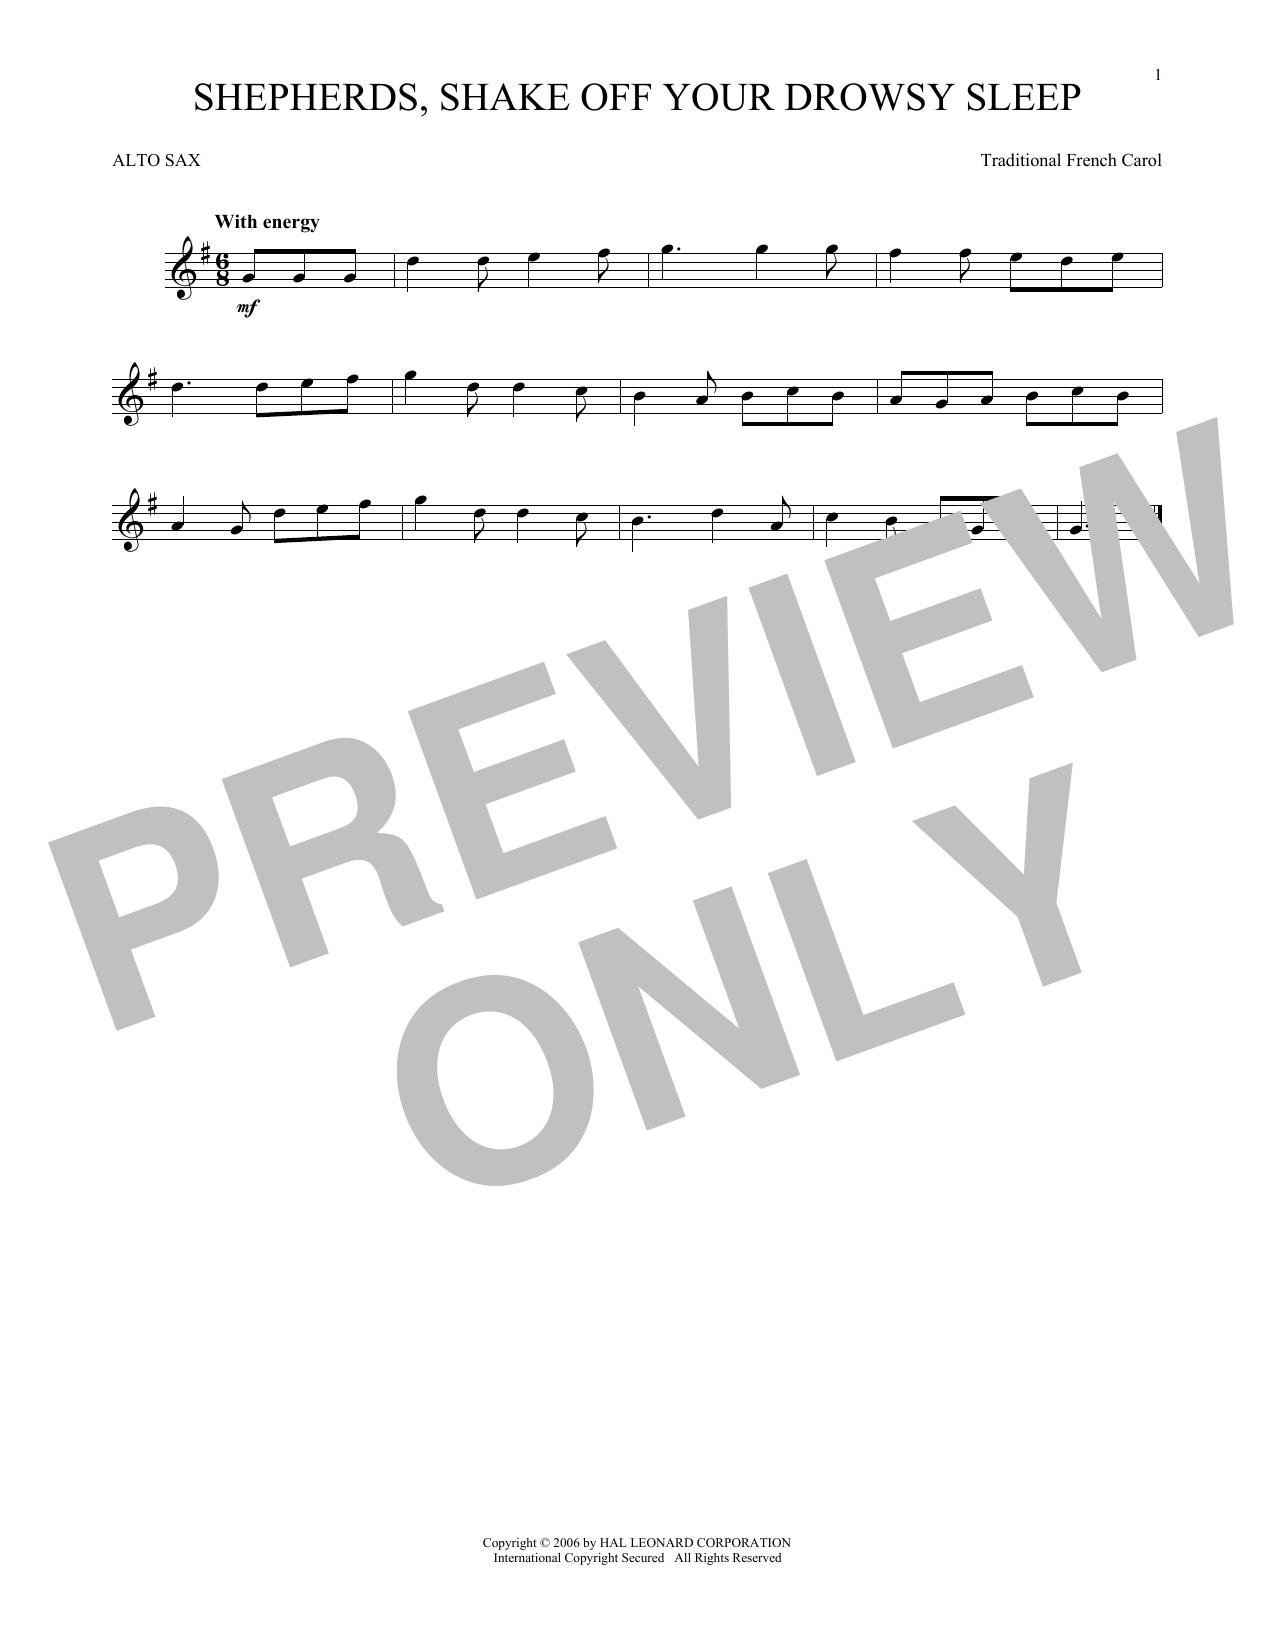 Partition saxophone Shepherds, Shake Off Your Drowsy Sleep de Traditional French Carol - Sax Alto